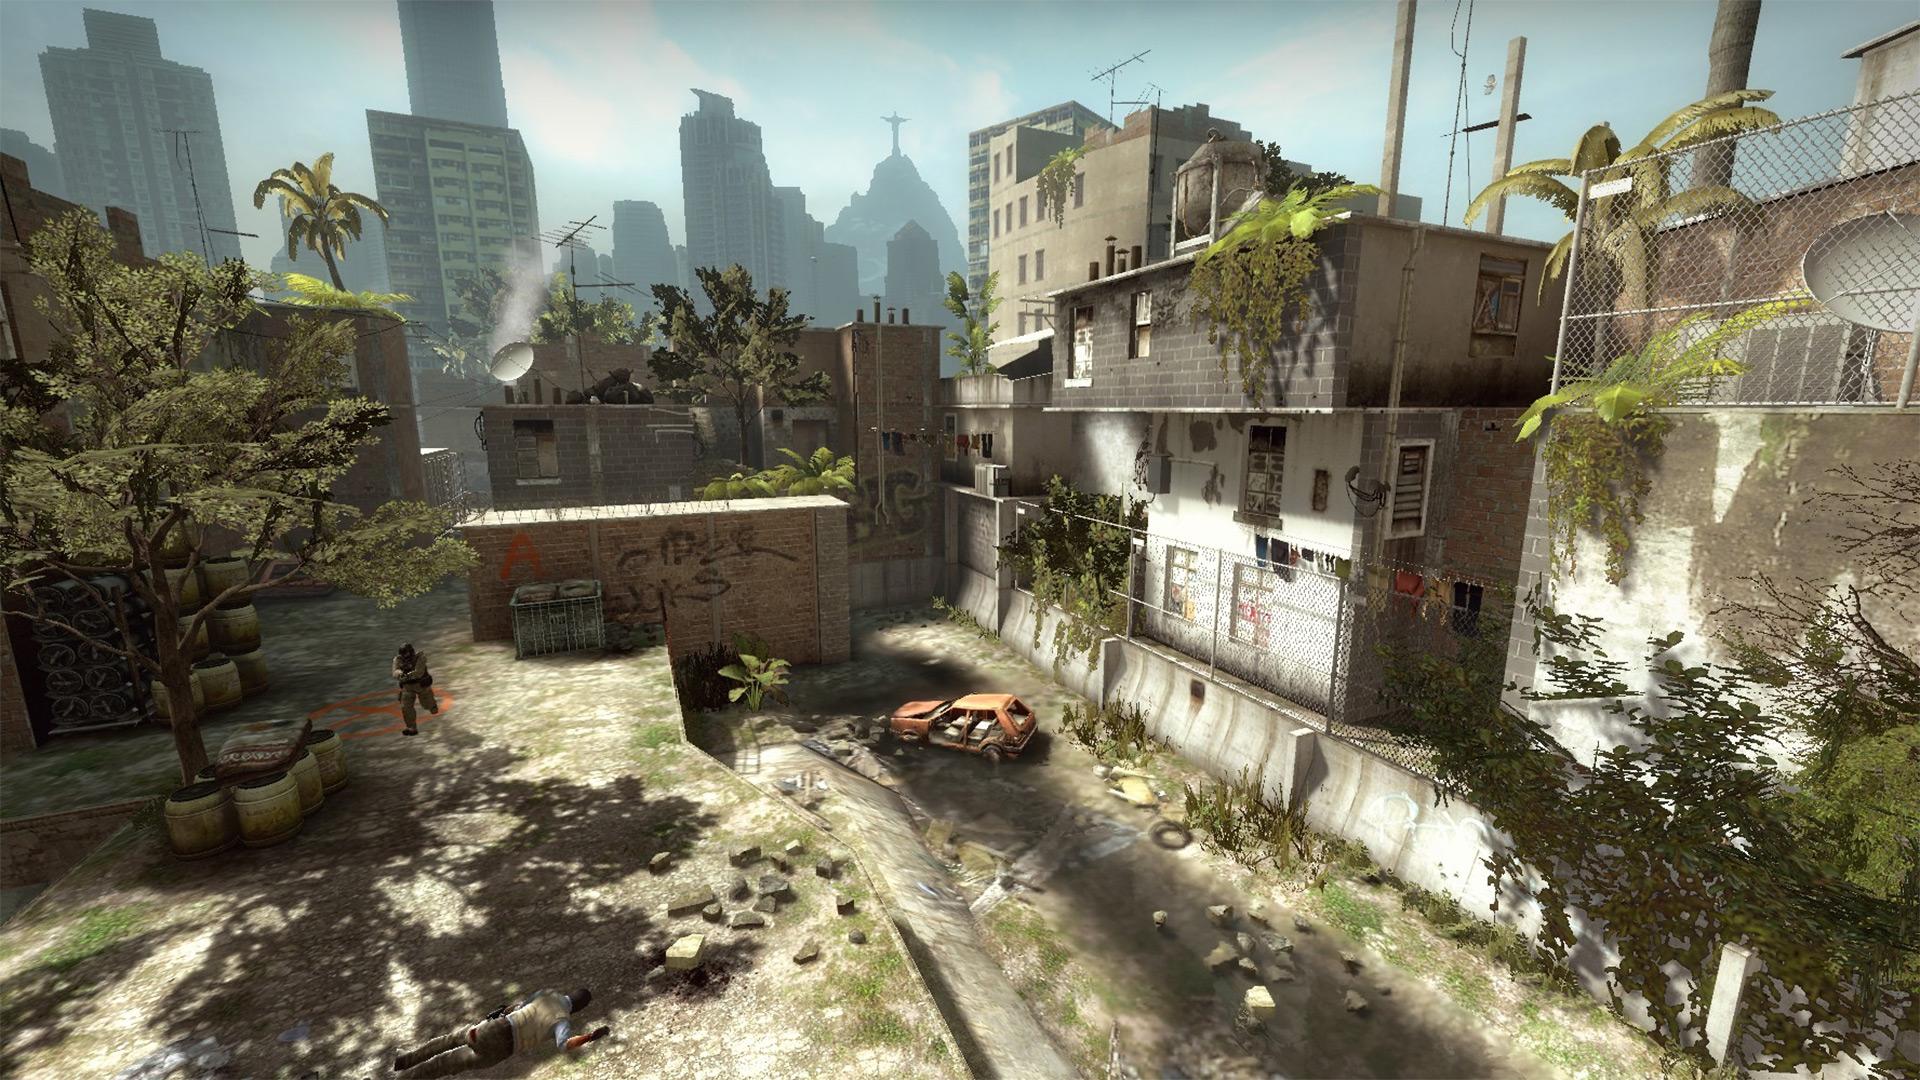 File:Csgo-de-favela.png